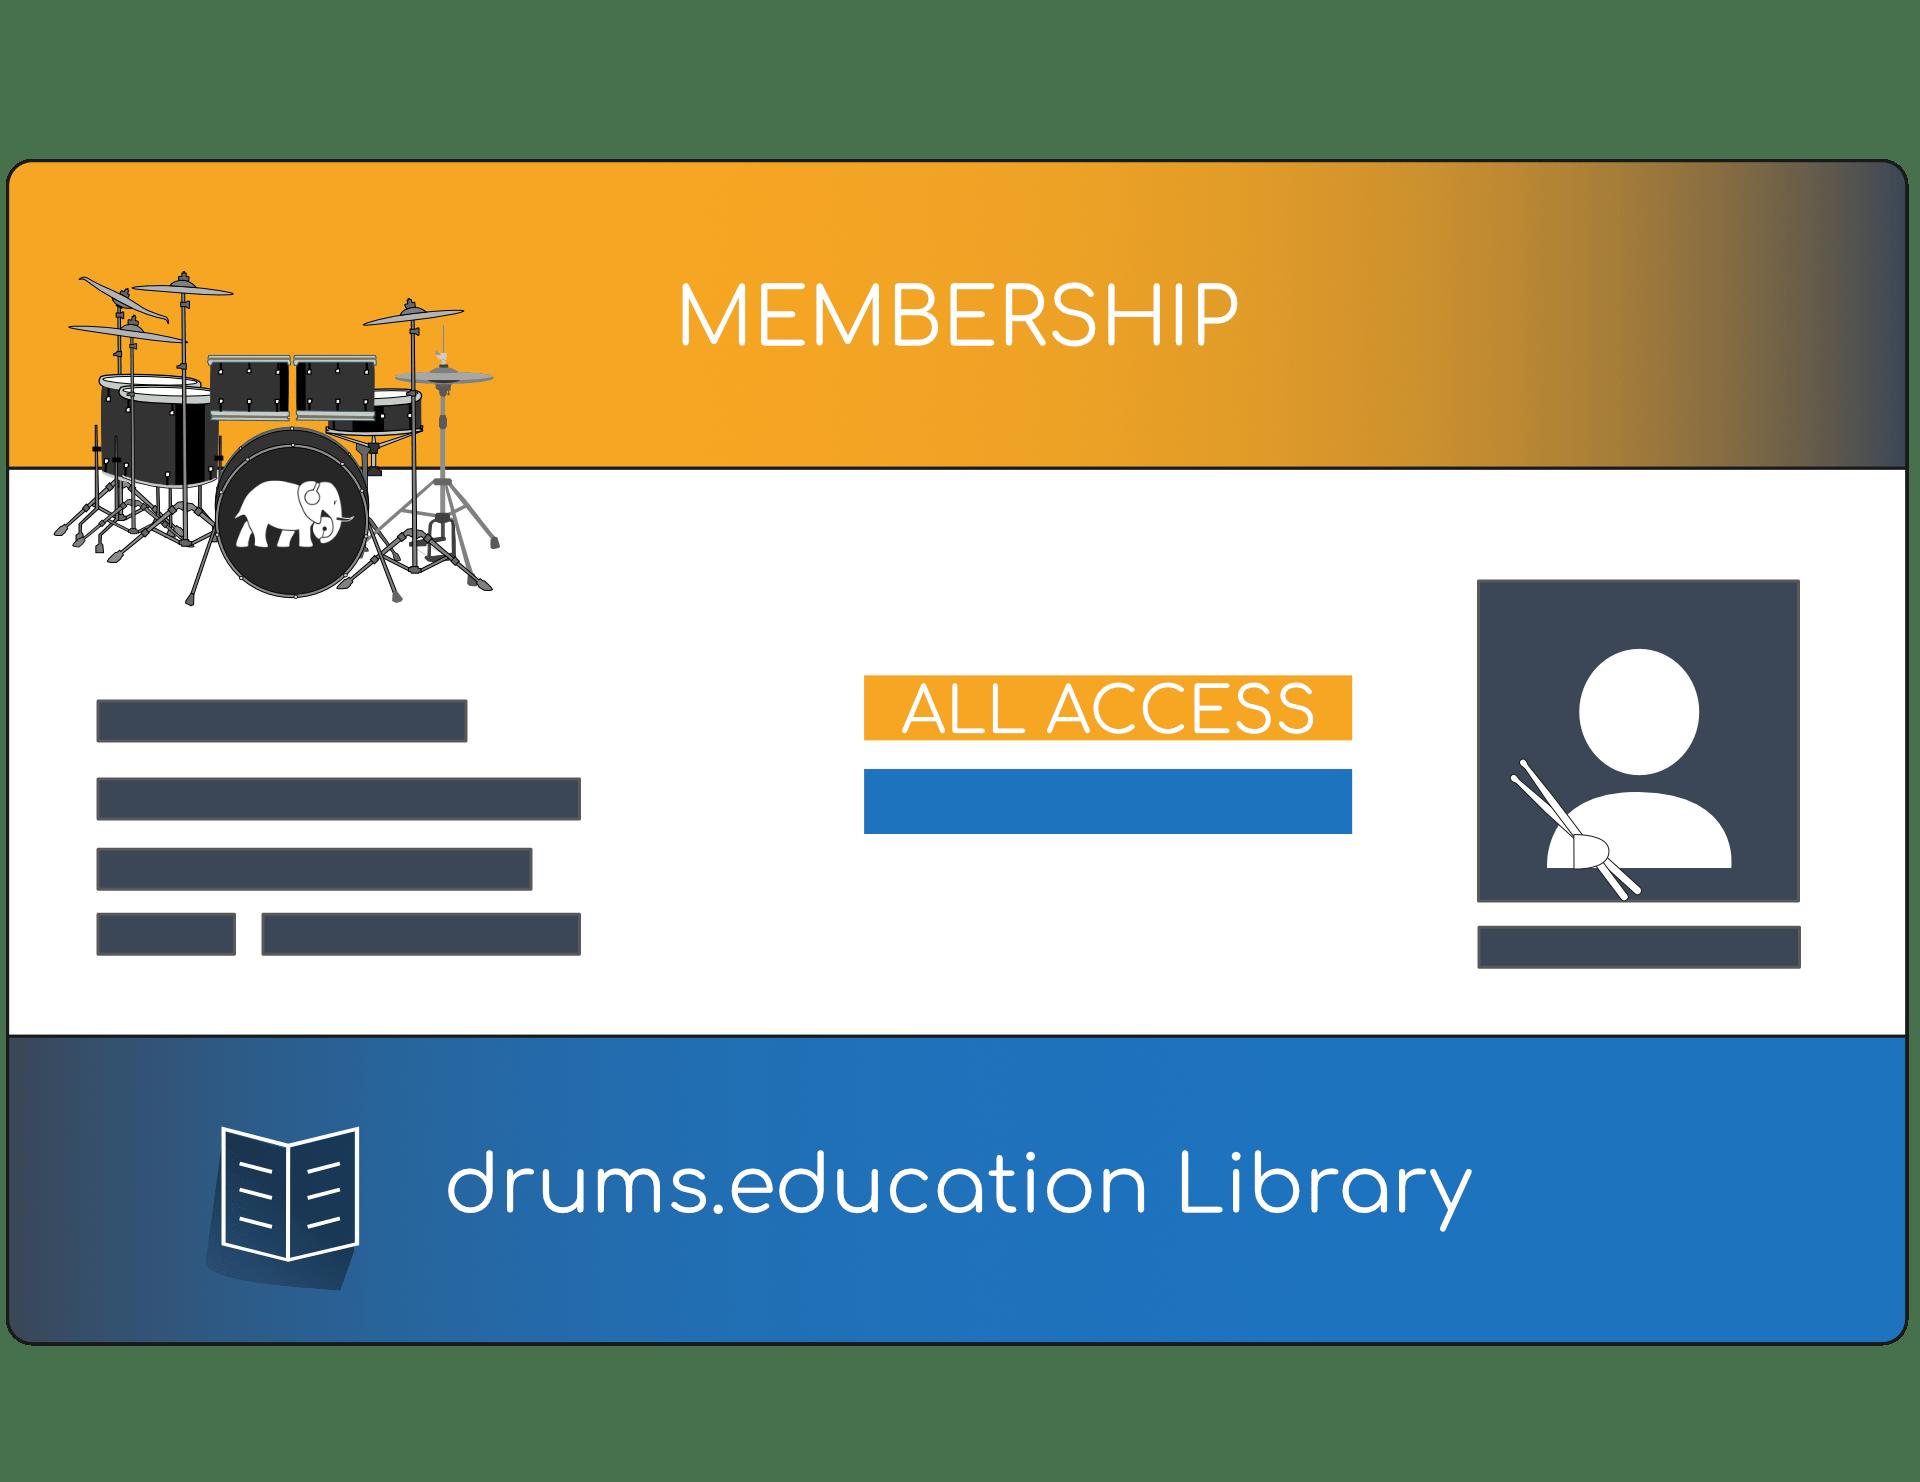 drums.education_Library Membership